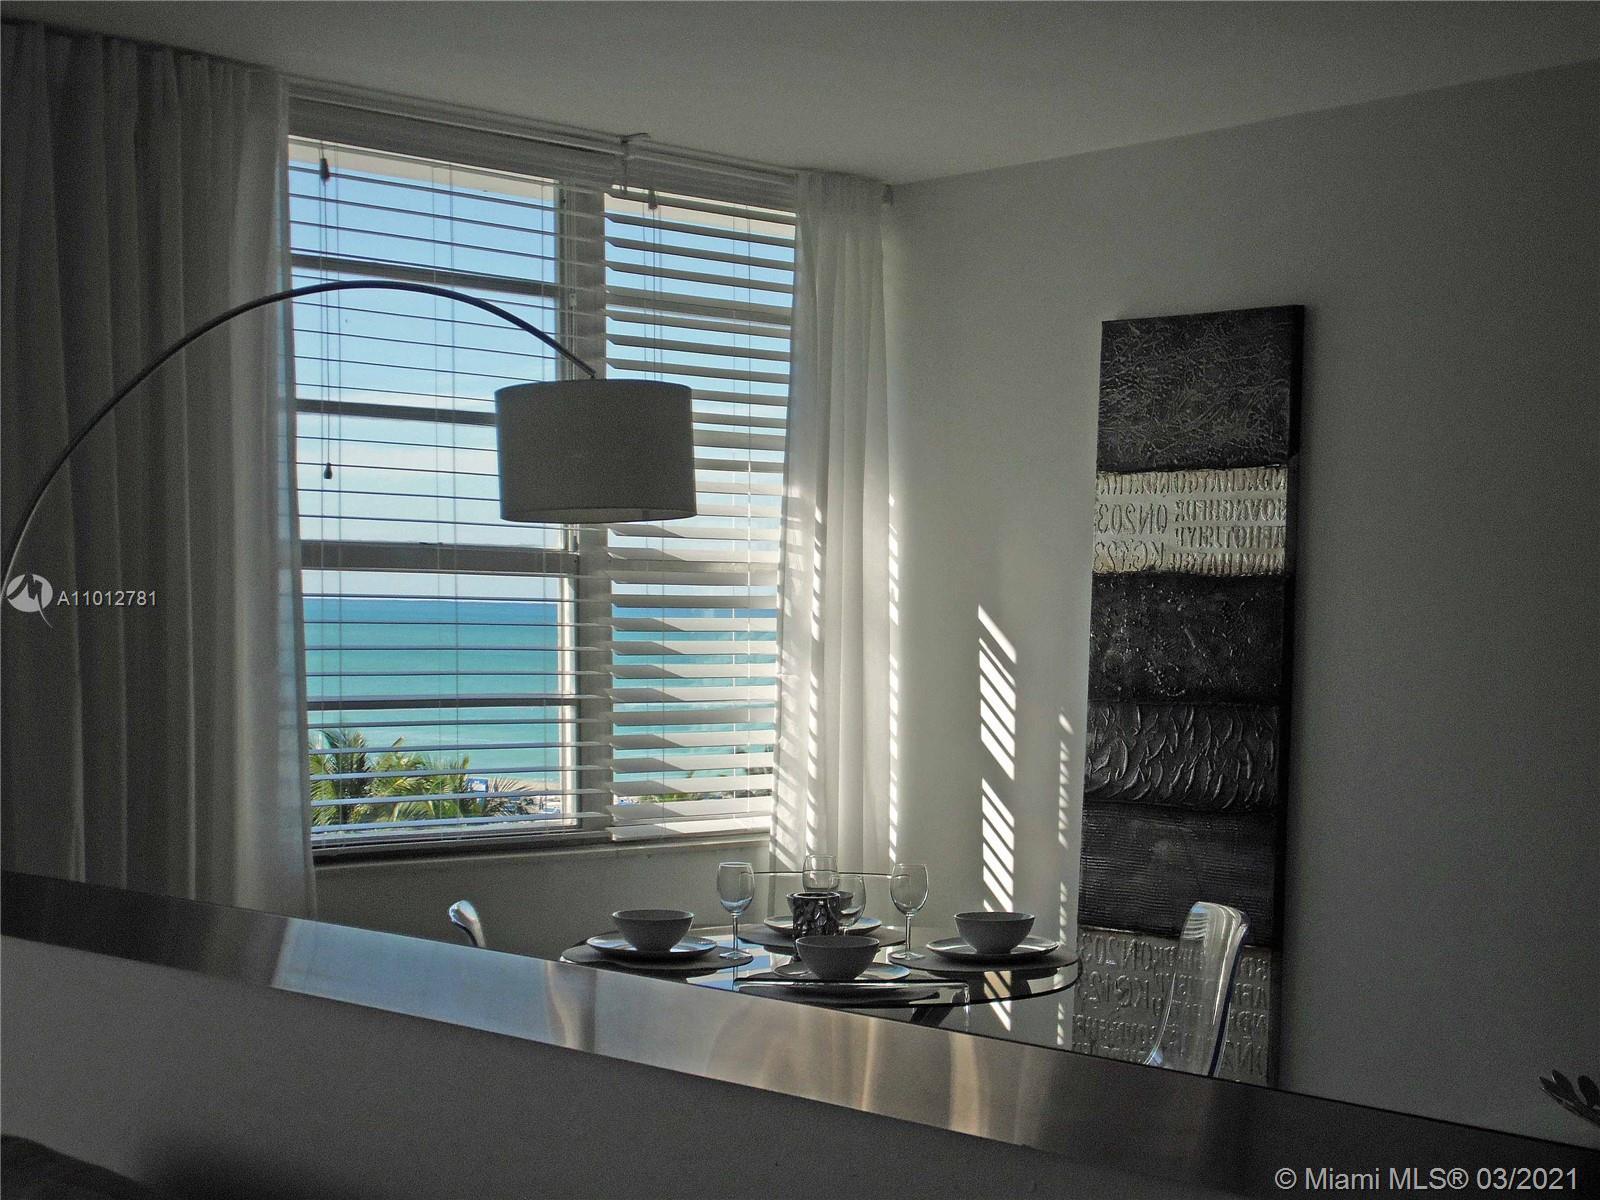 Decoplage #638 - 100 Lincoln Rd #638, Miami Beach, FL 33139